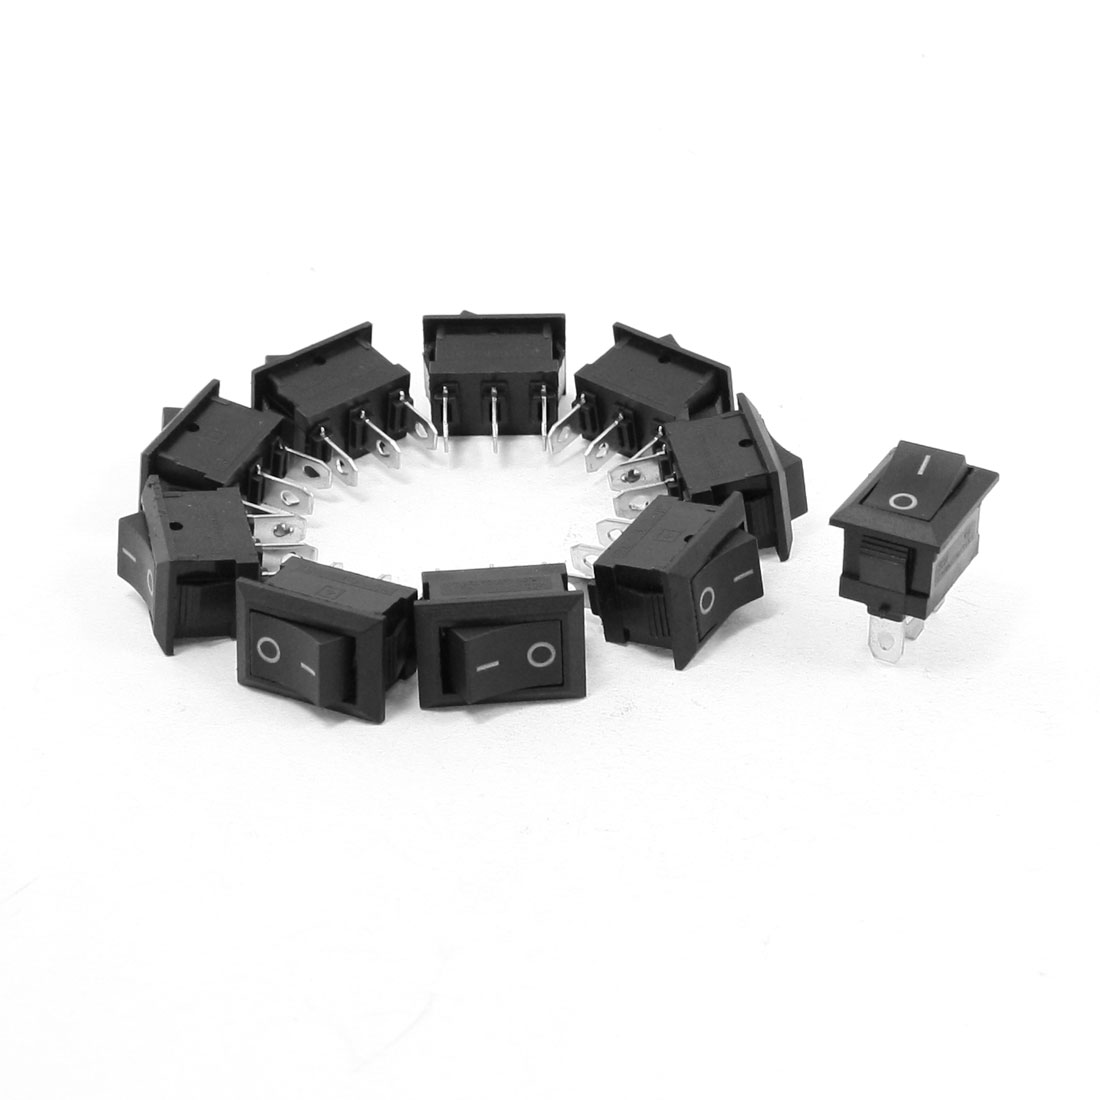 10 Pcs AC 250V 6A AC 125V 10A 3 Terminals SPDT Black Button Rocker Switch